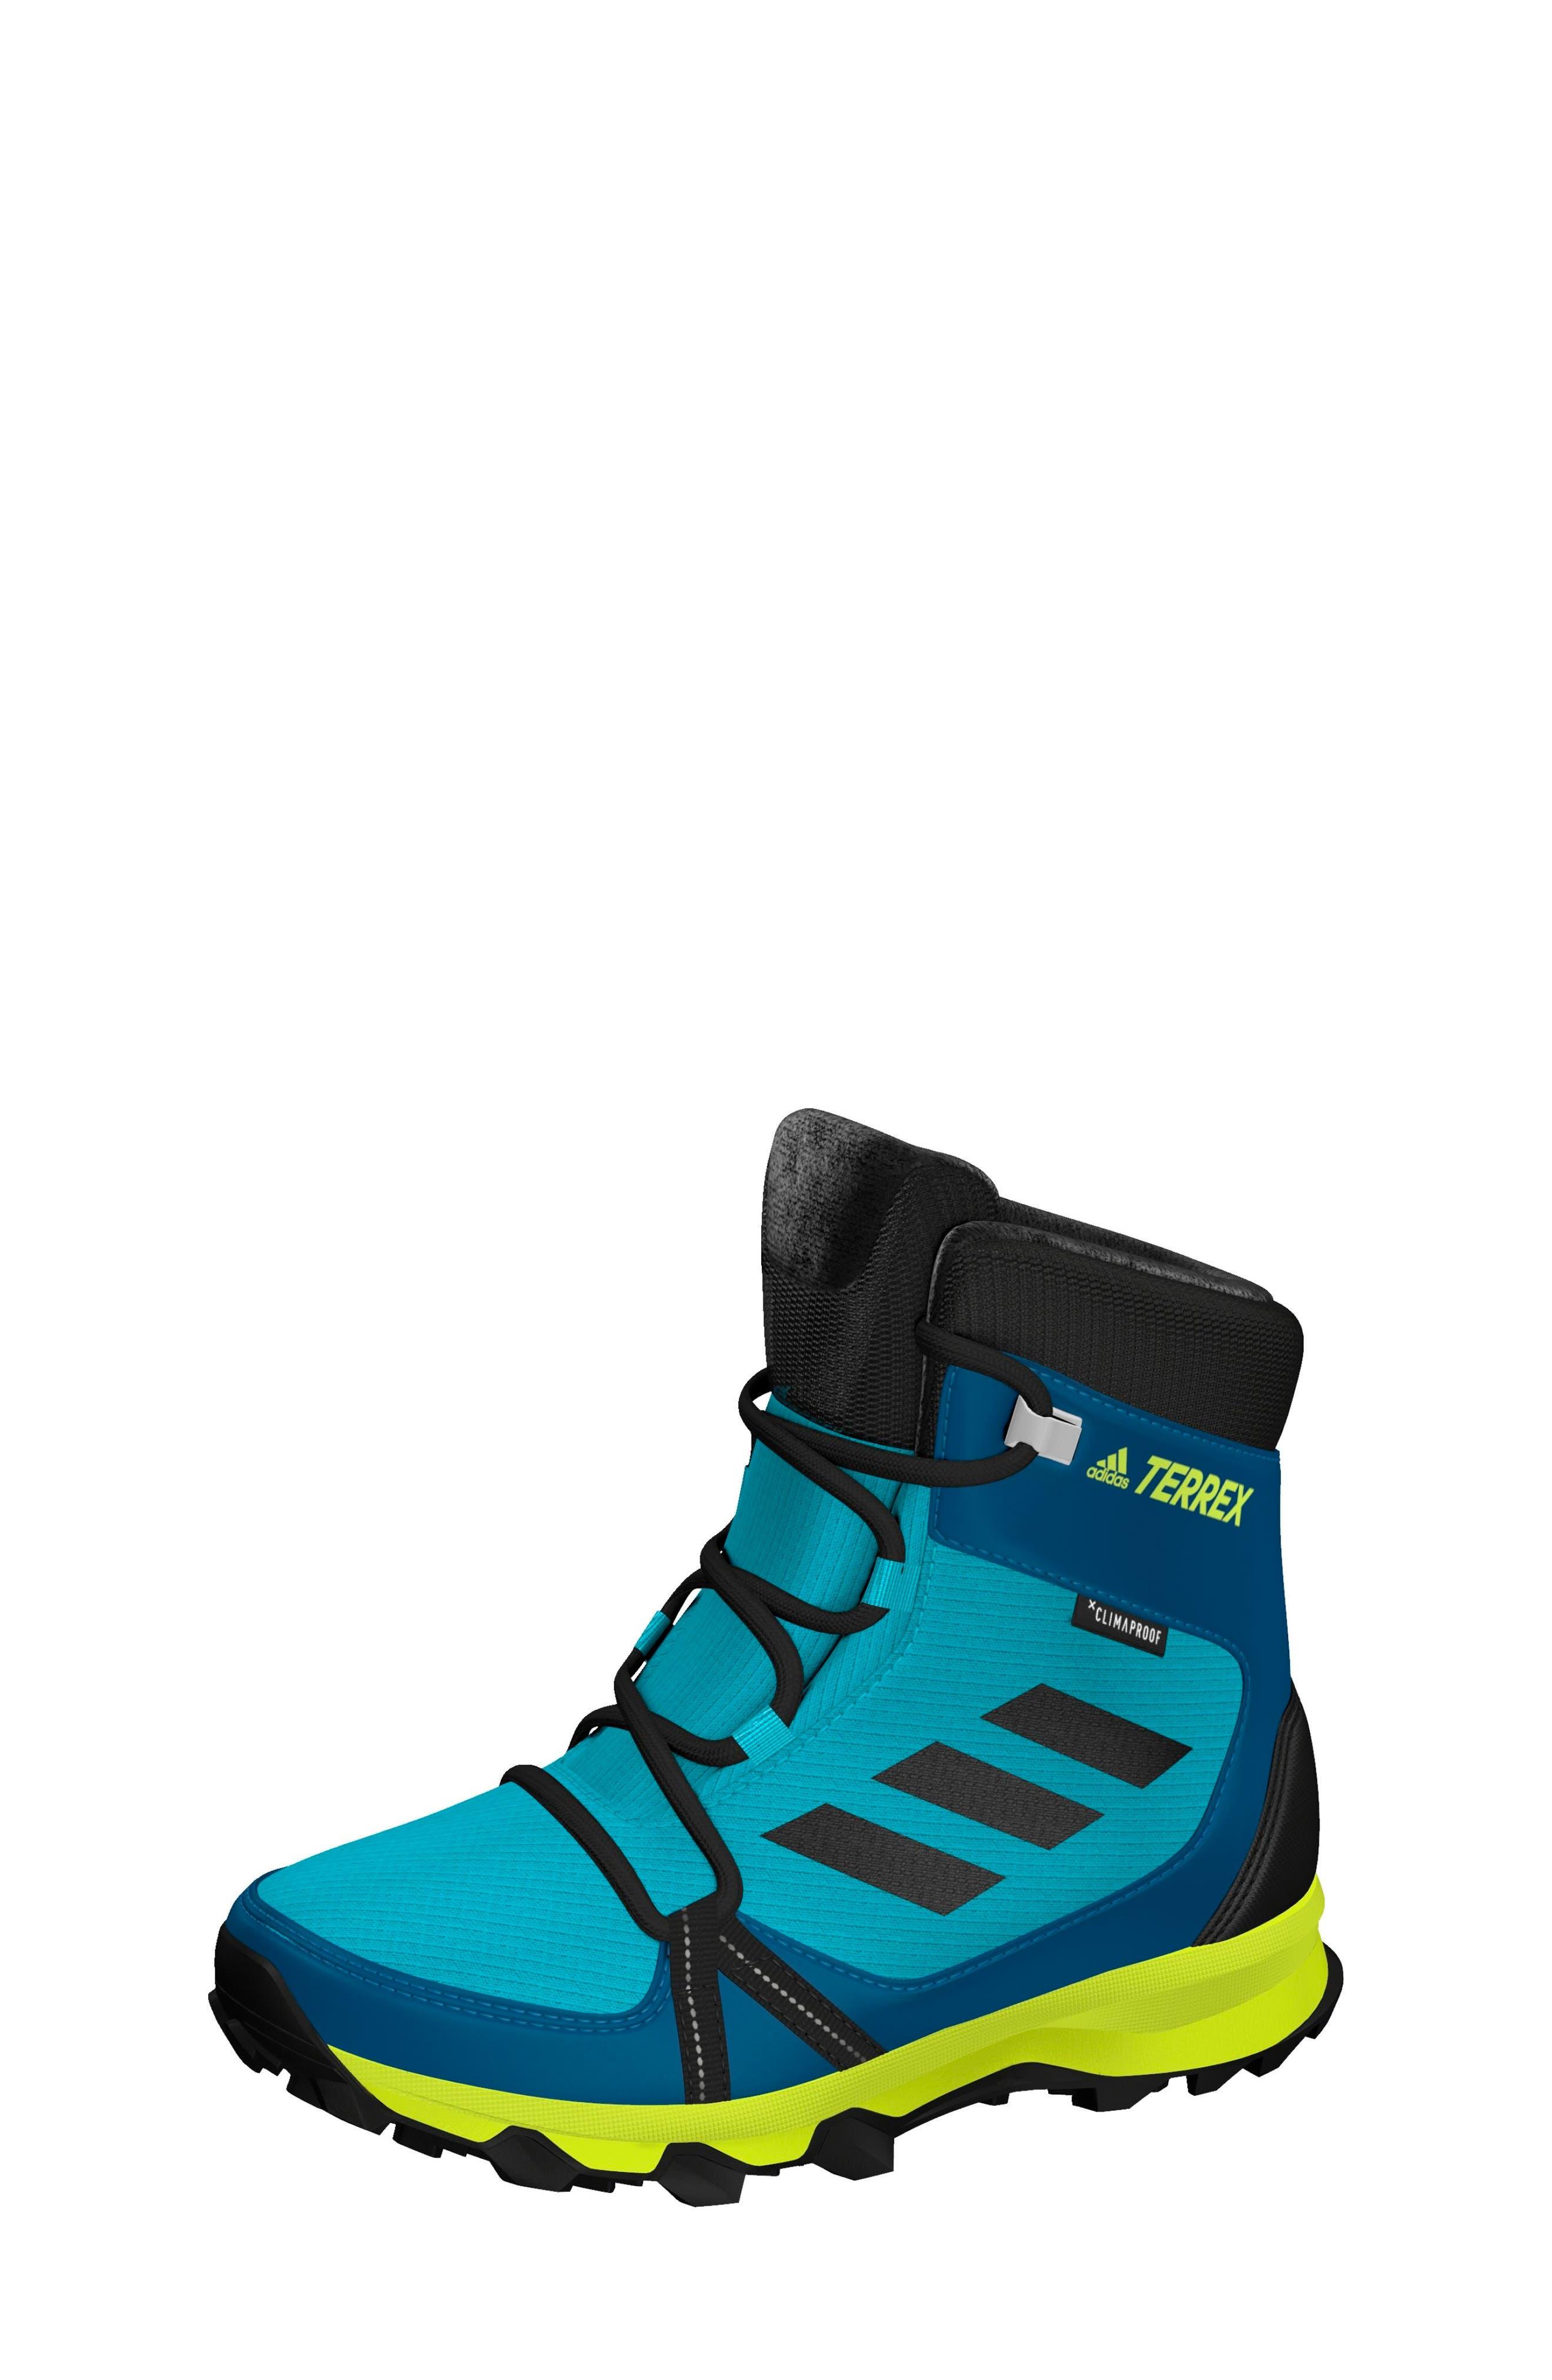 Terrex Snow Sneaker Boot,                             Main thumbnail 1, color,